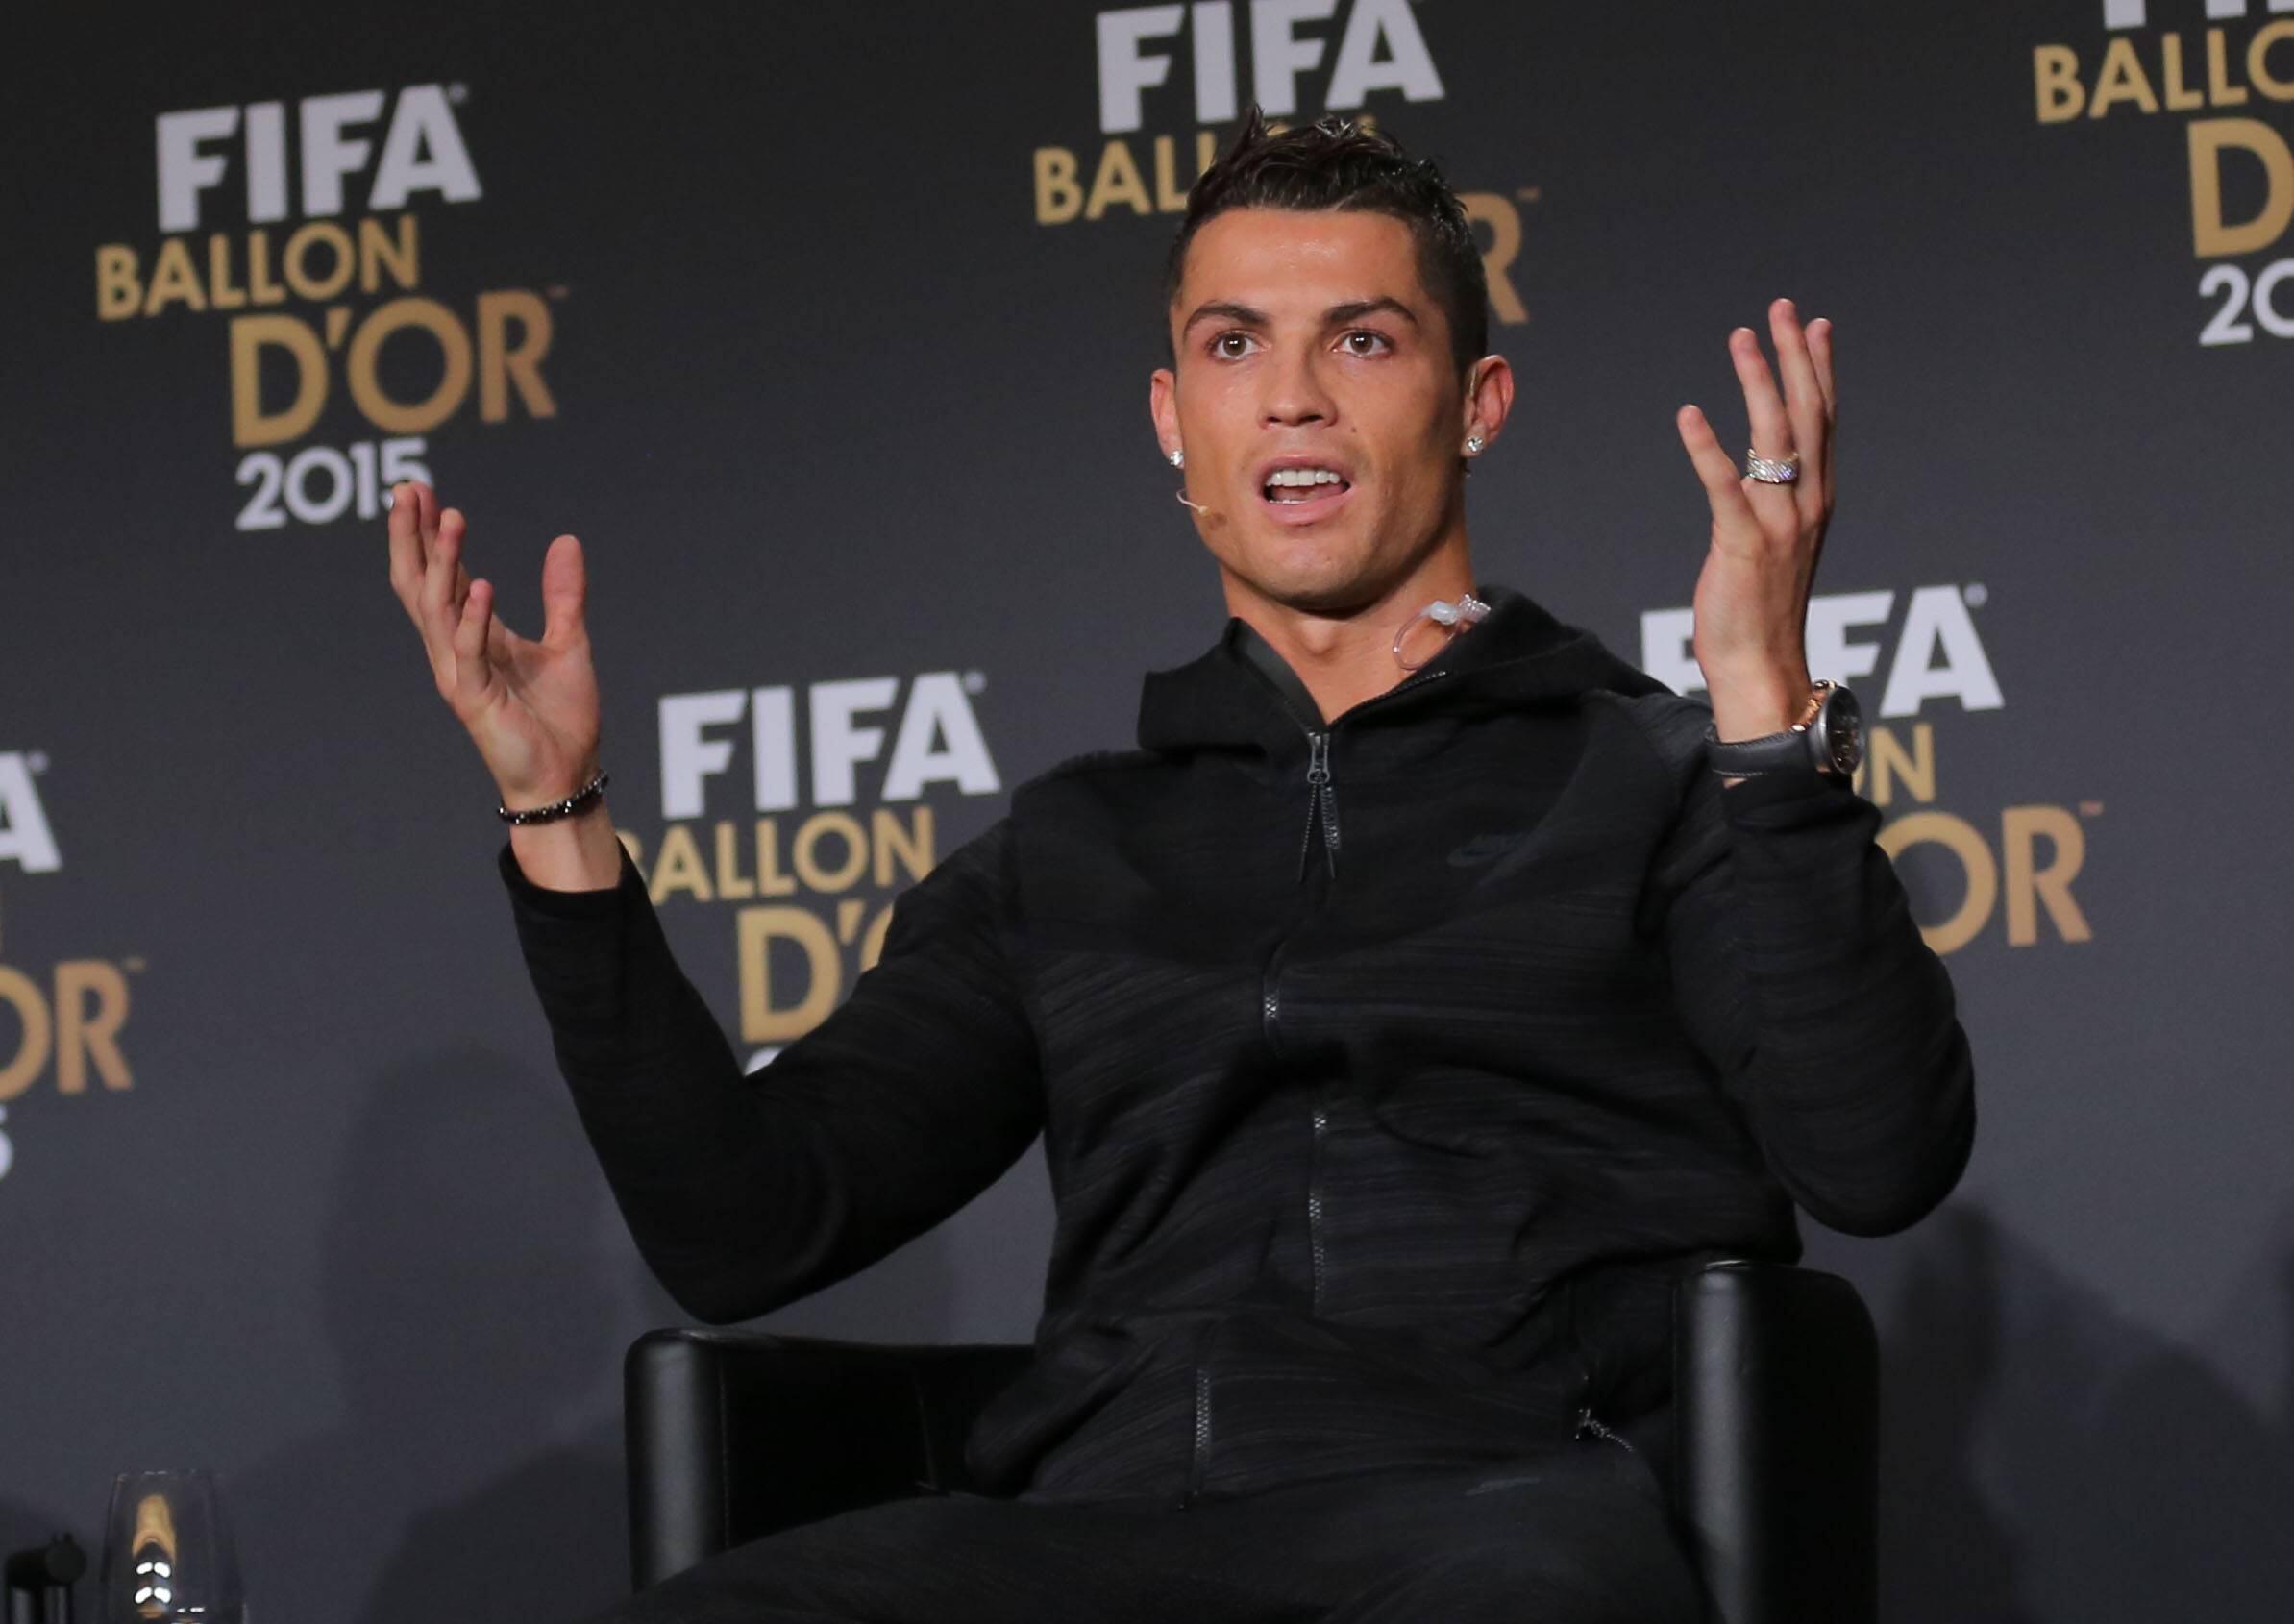 Bild zu Cristiano Ronaldo, FIFA, Weltfußballer